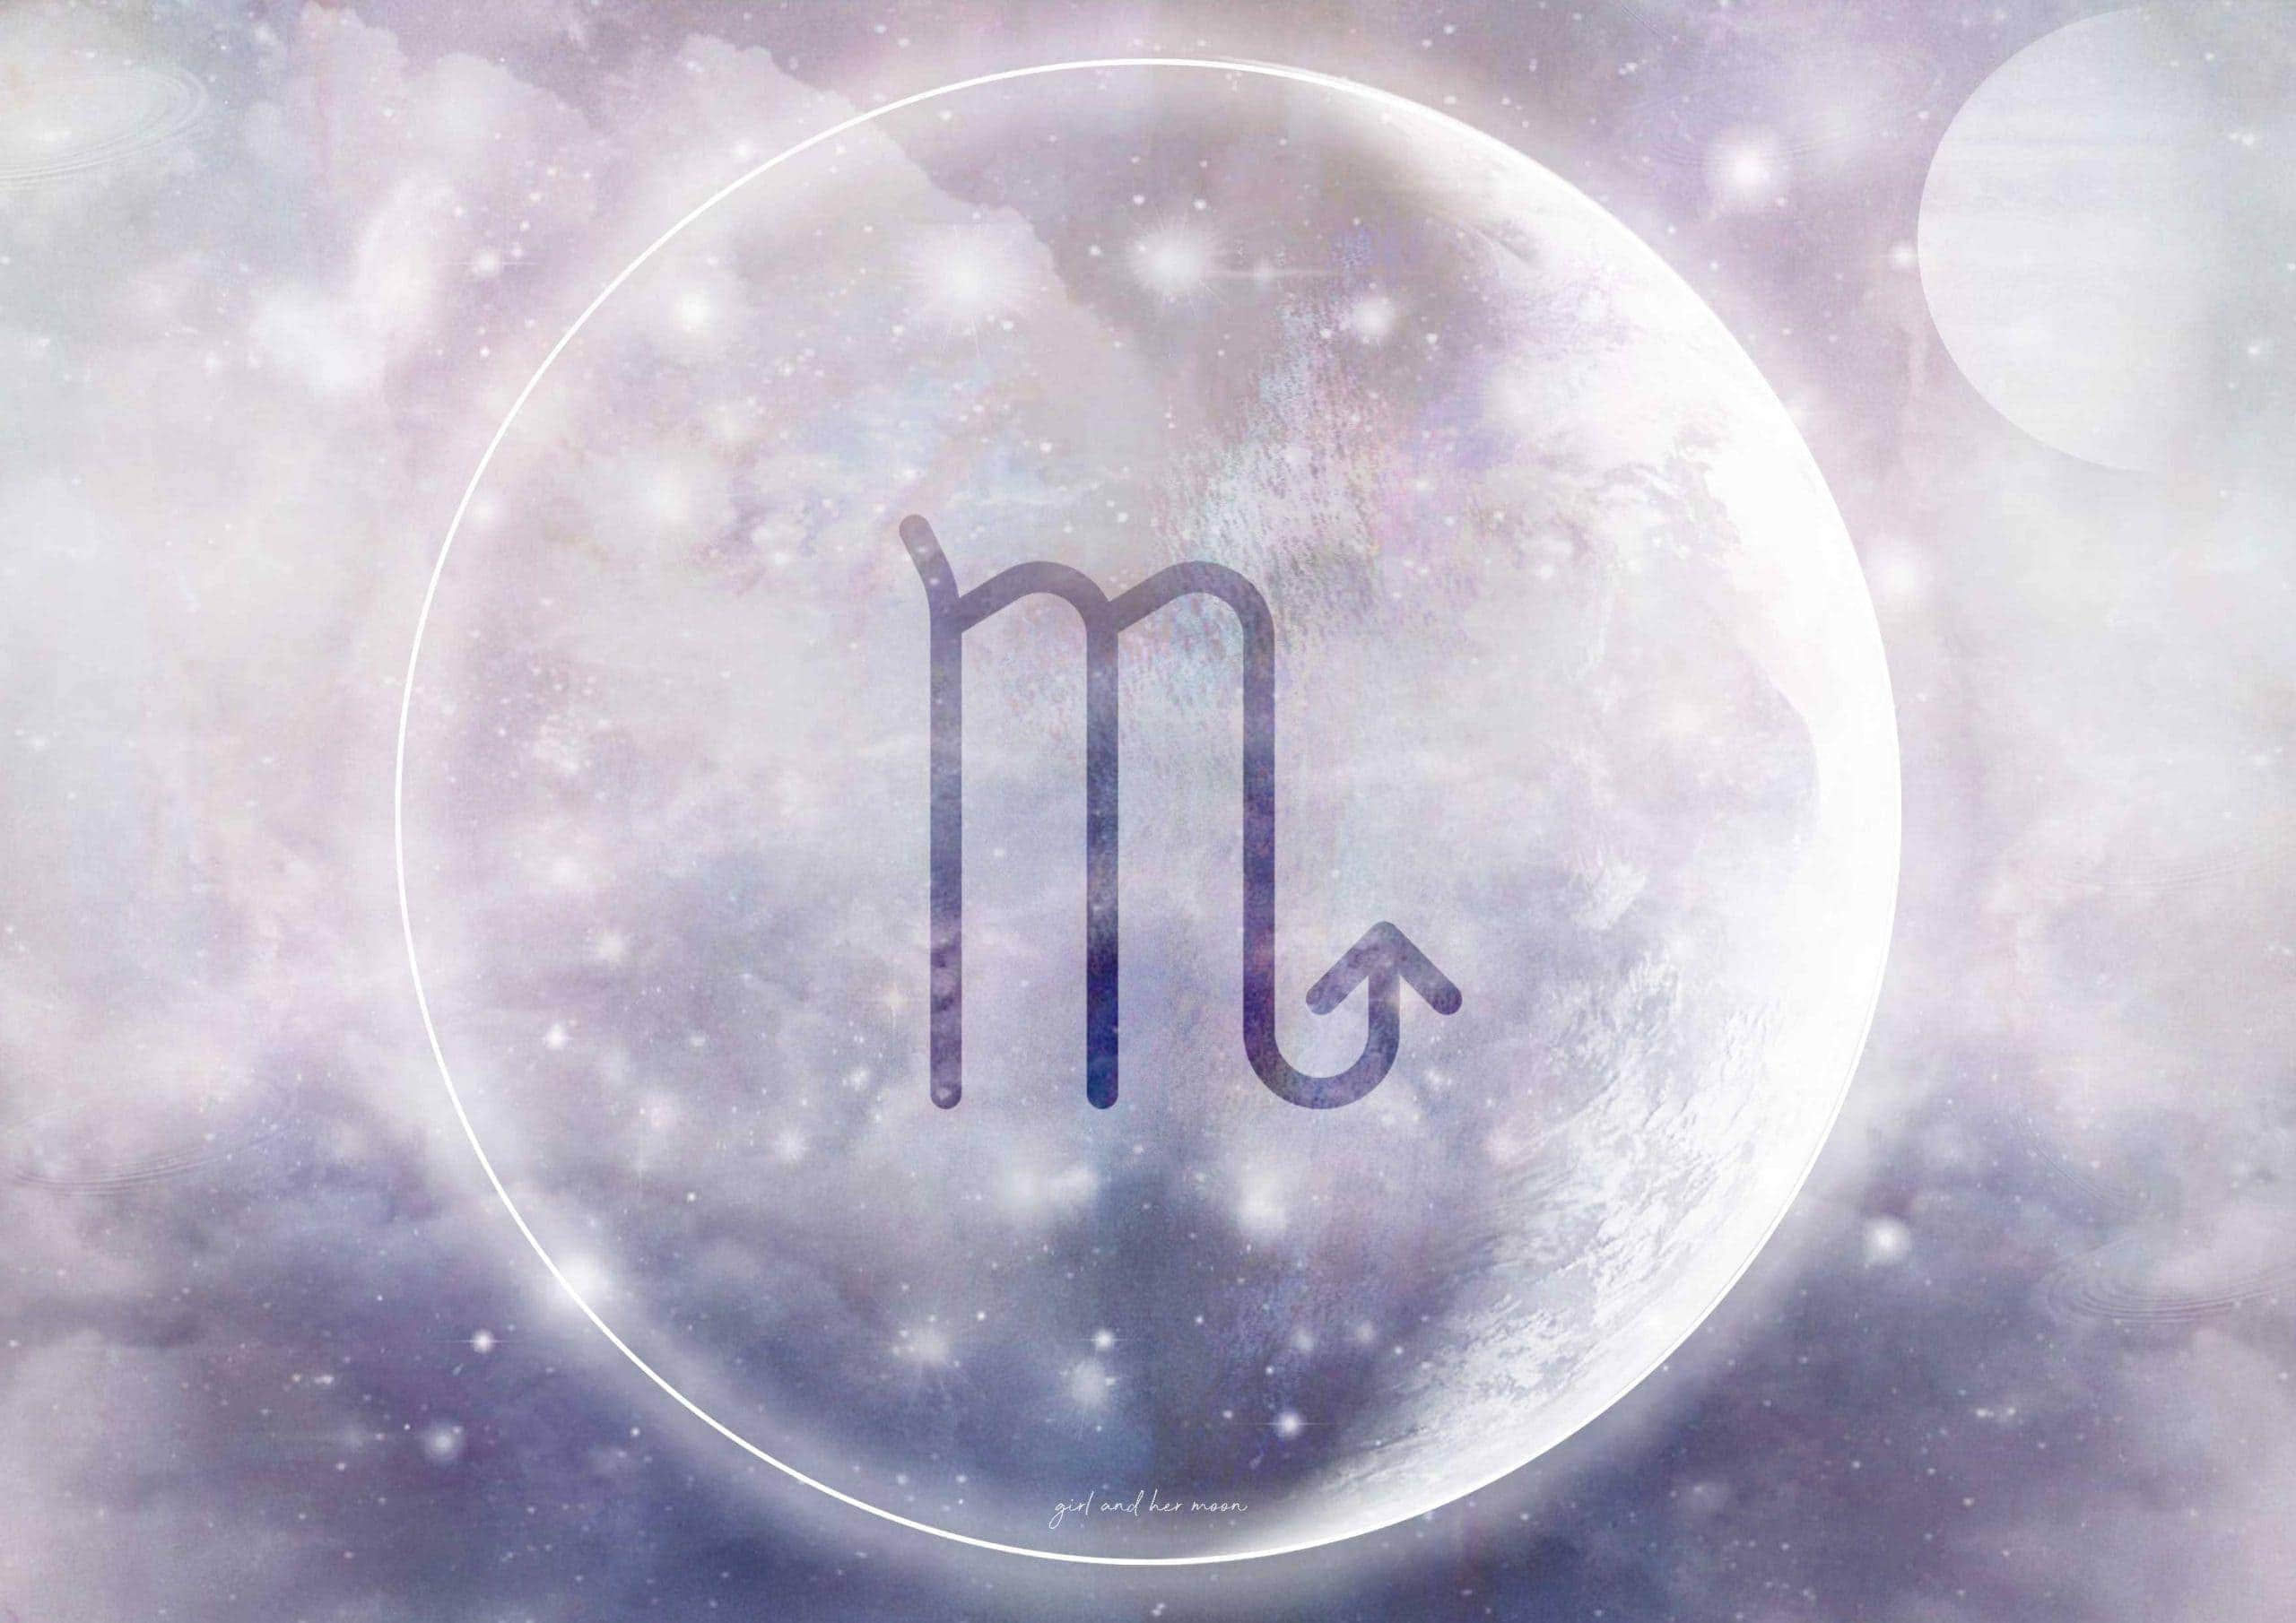 SCORPIO NEW MOON NOVEMBER 2020 Girl and Her Moon